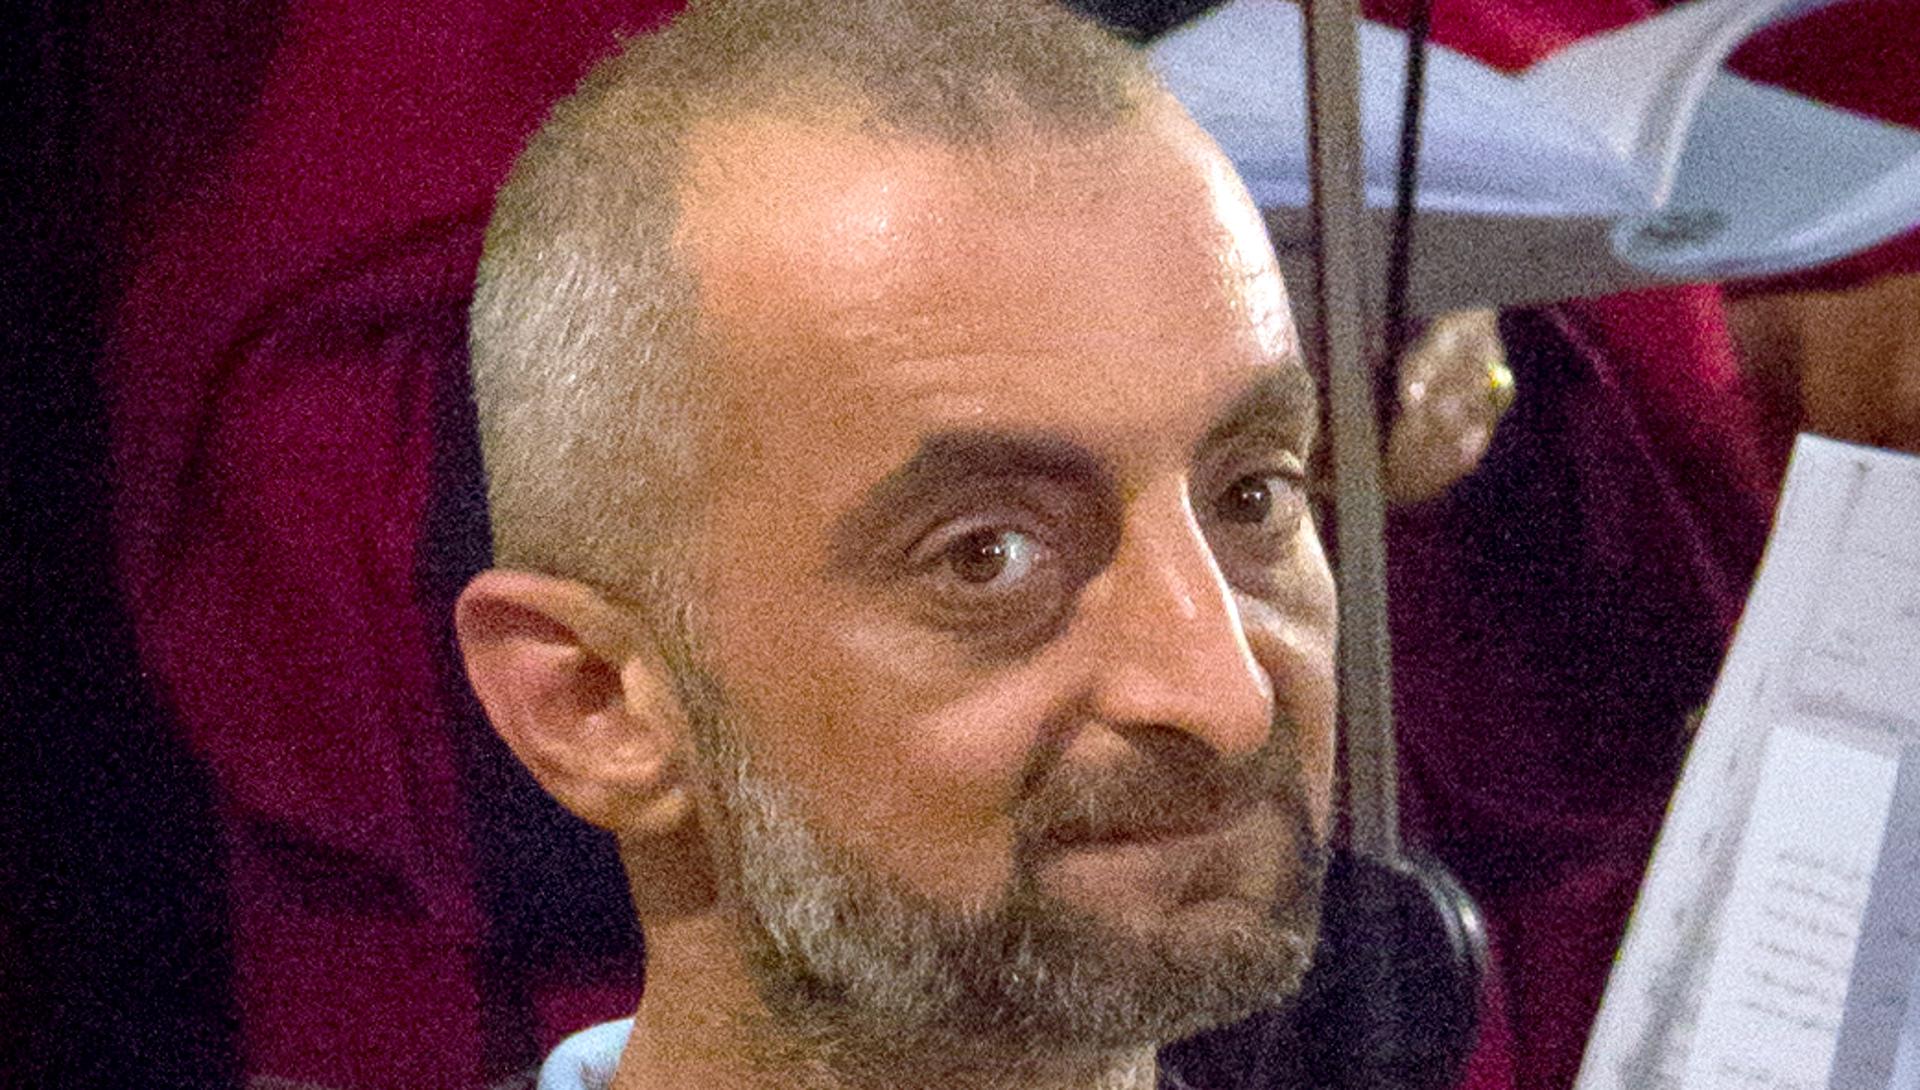 Священник-францисканец Дхия Аззиз, вероятно, снова похищен